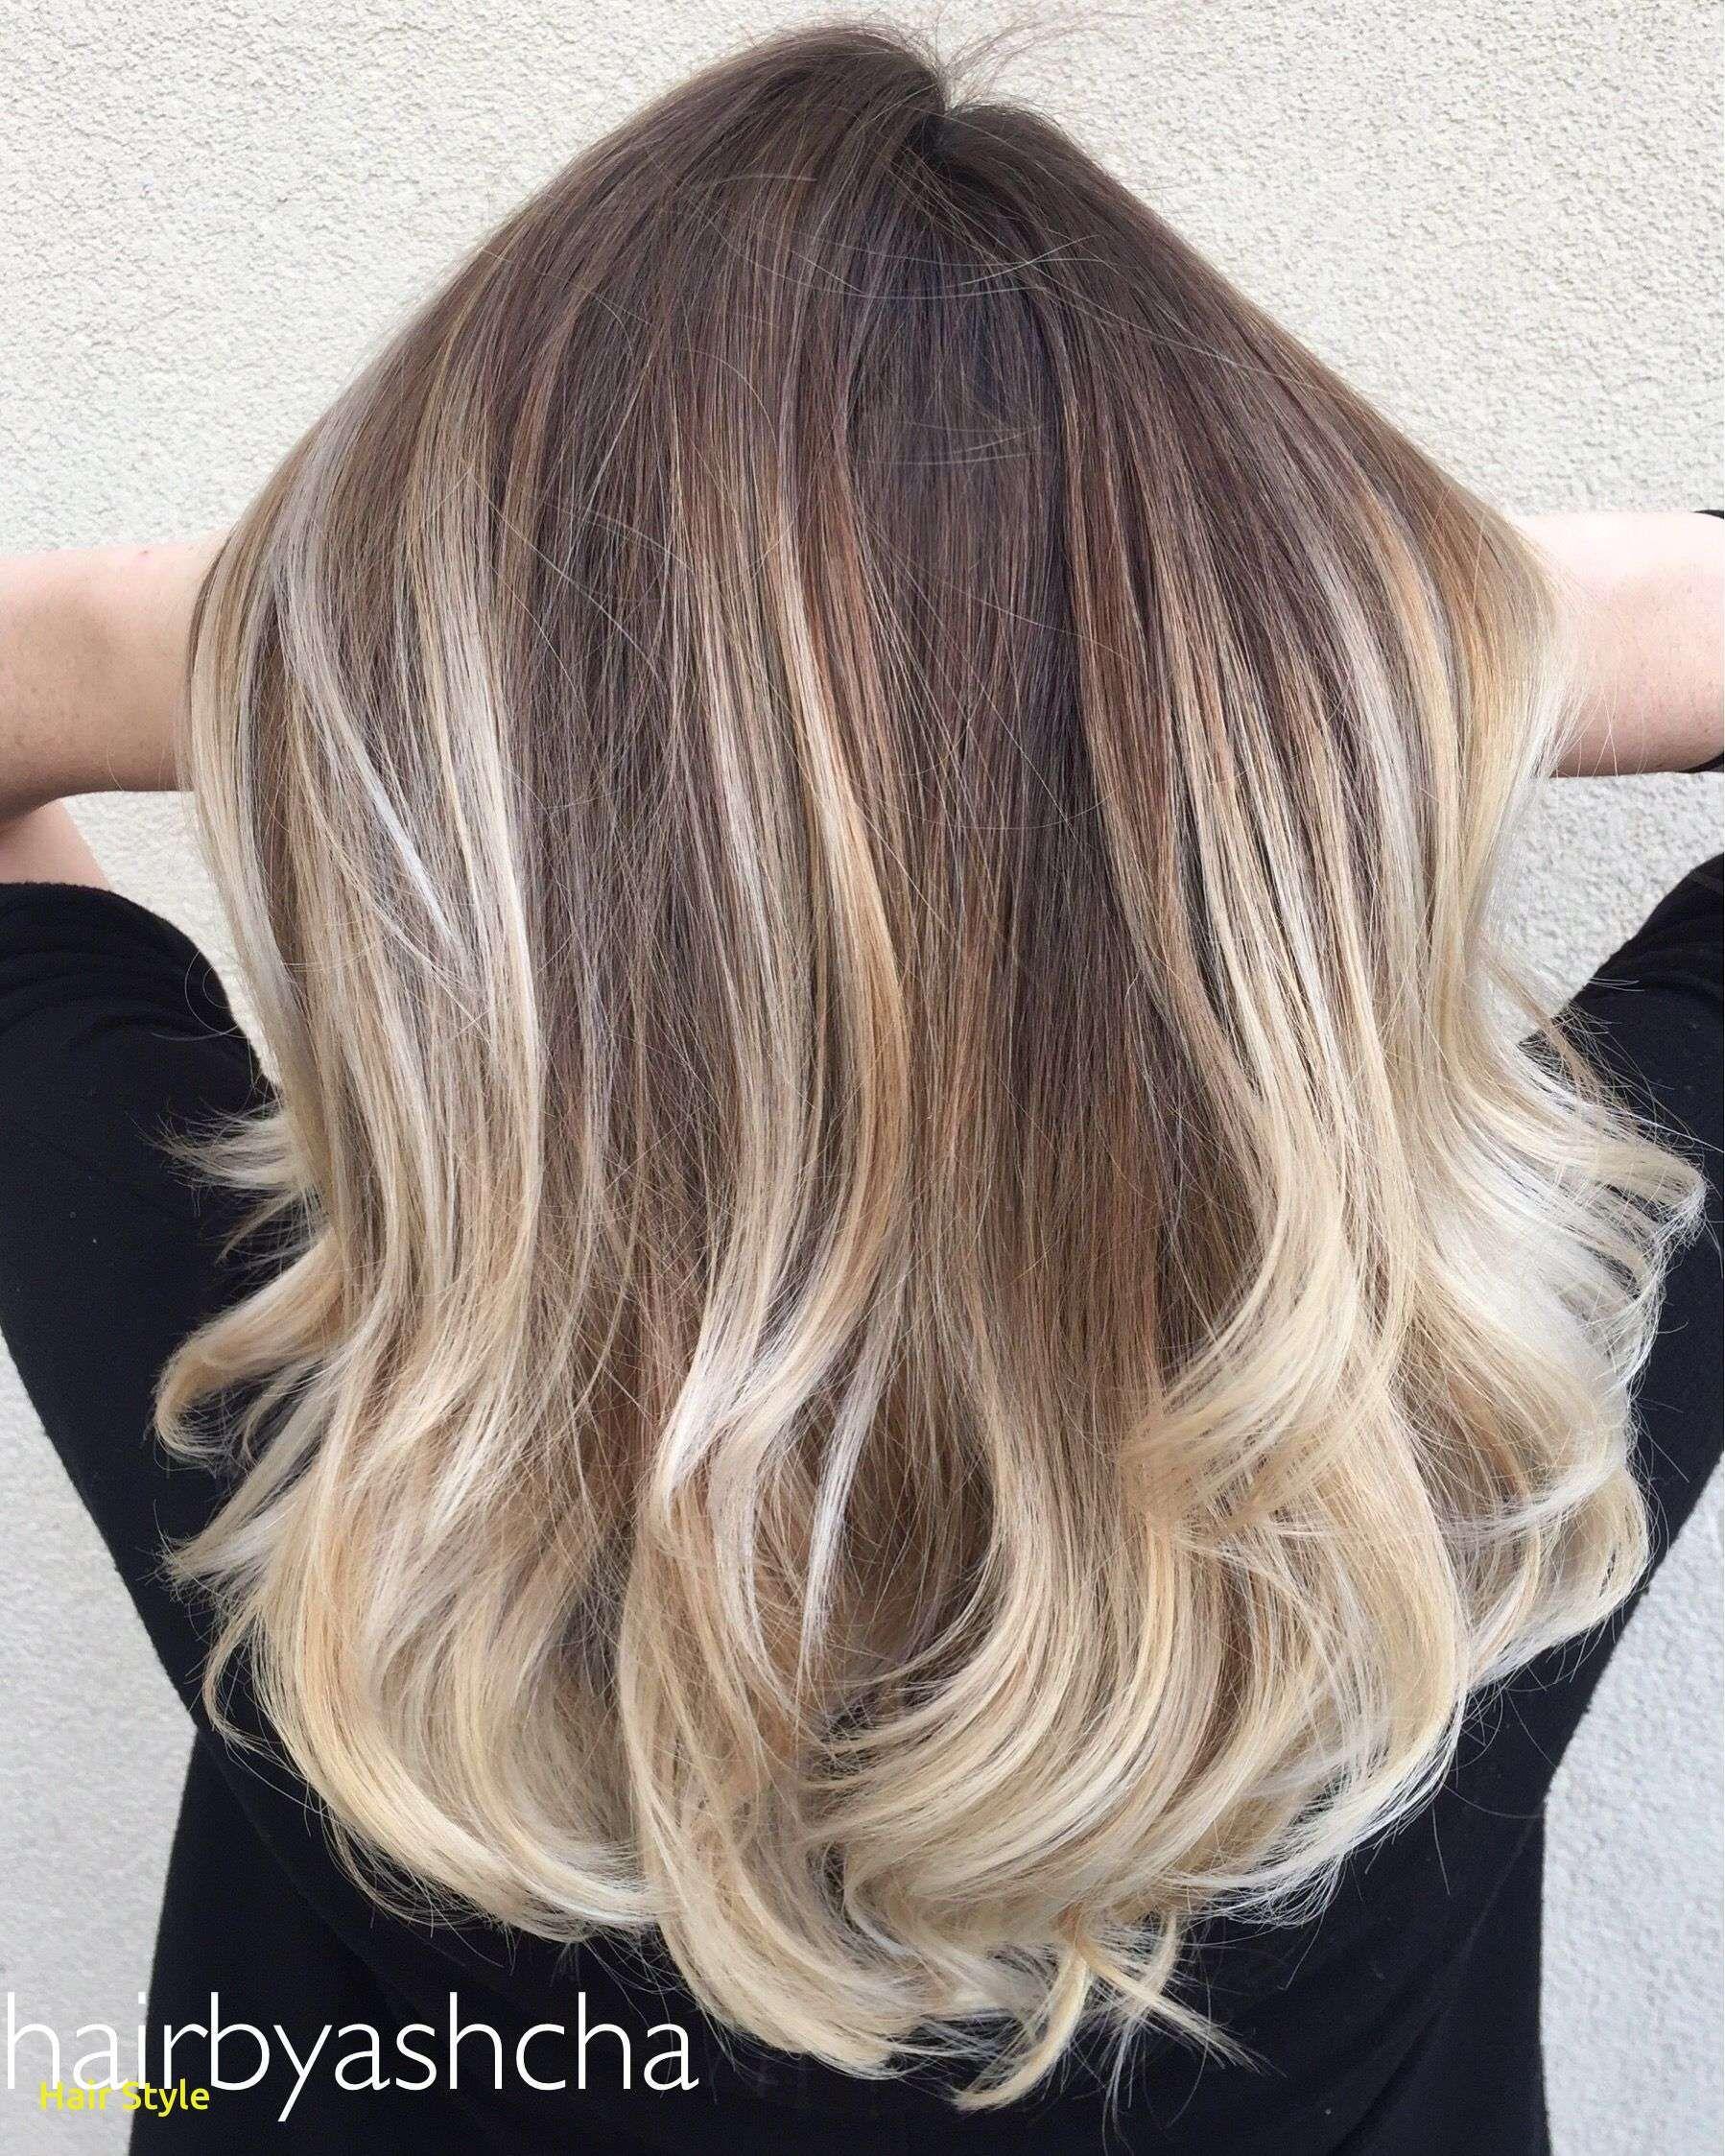 Caramel hair color boy frische haarfarbe trends balayage  haarschnitte  pinterest